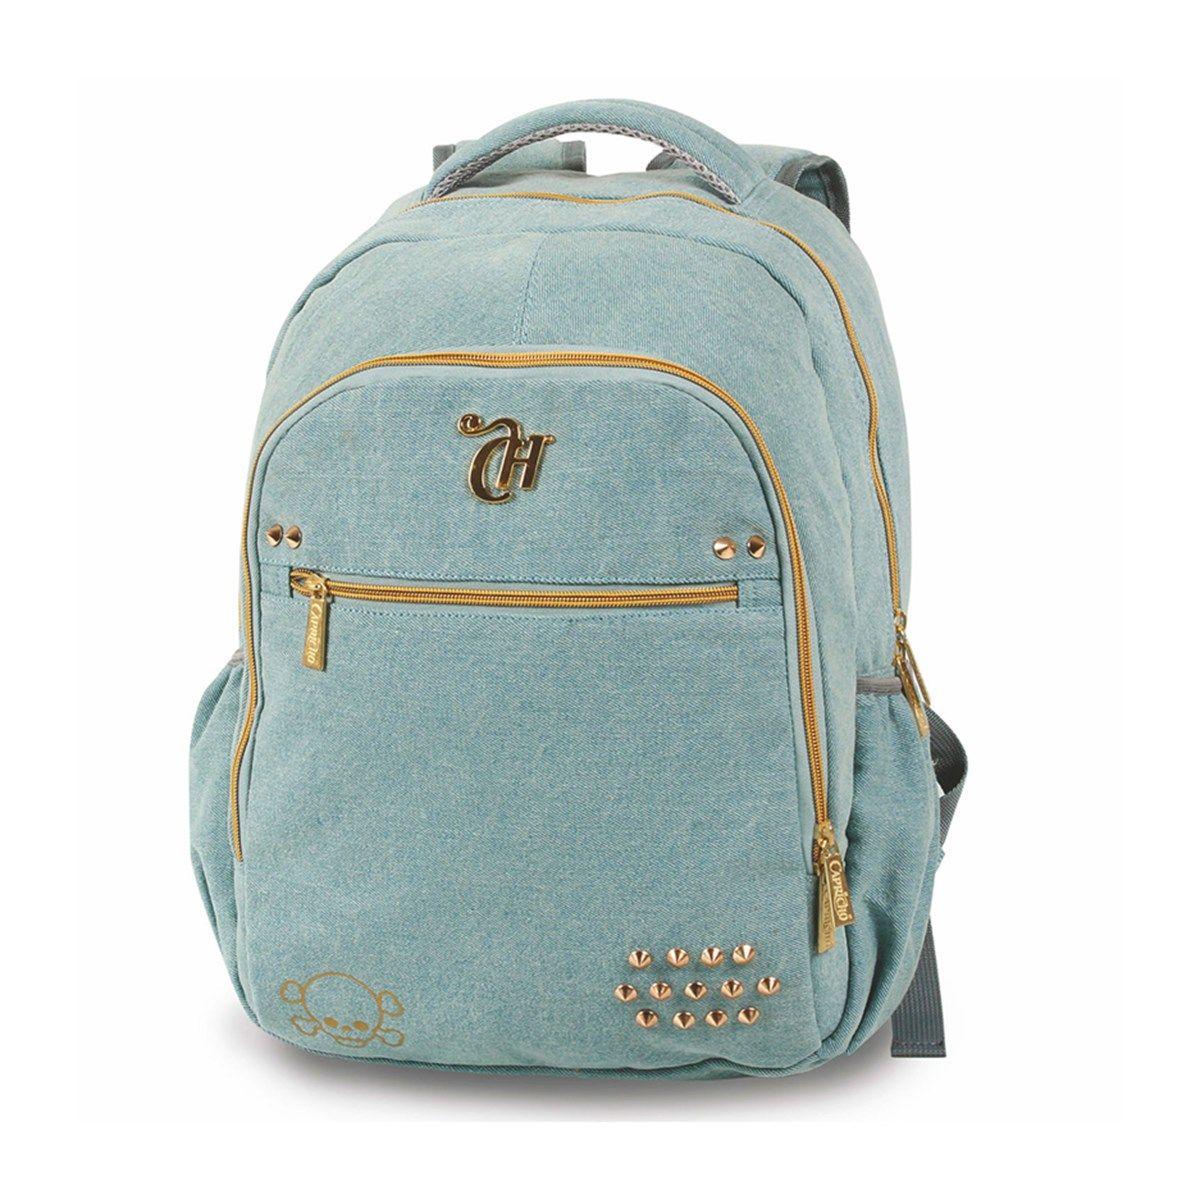 mochila capricho - Pesquisa Google   pra escola tumblr♡◇❤ 044dba0955